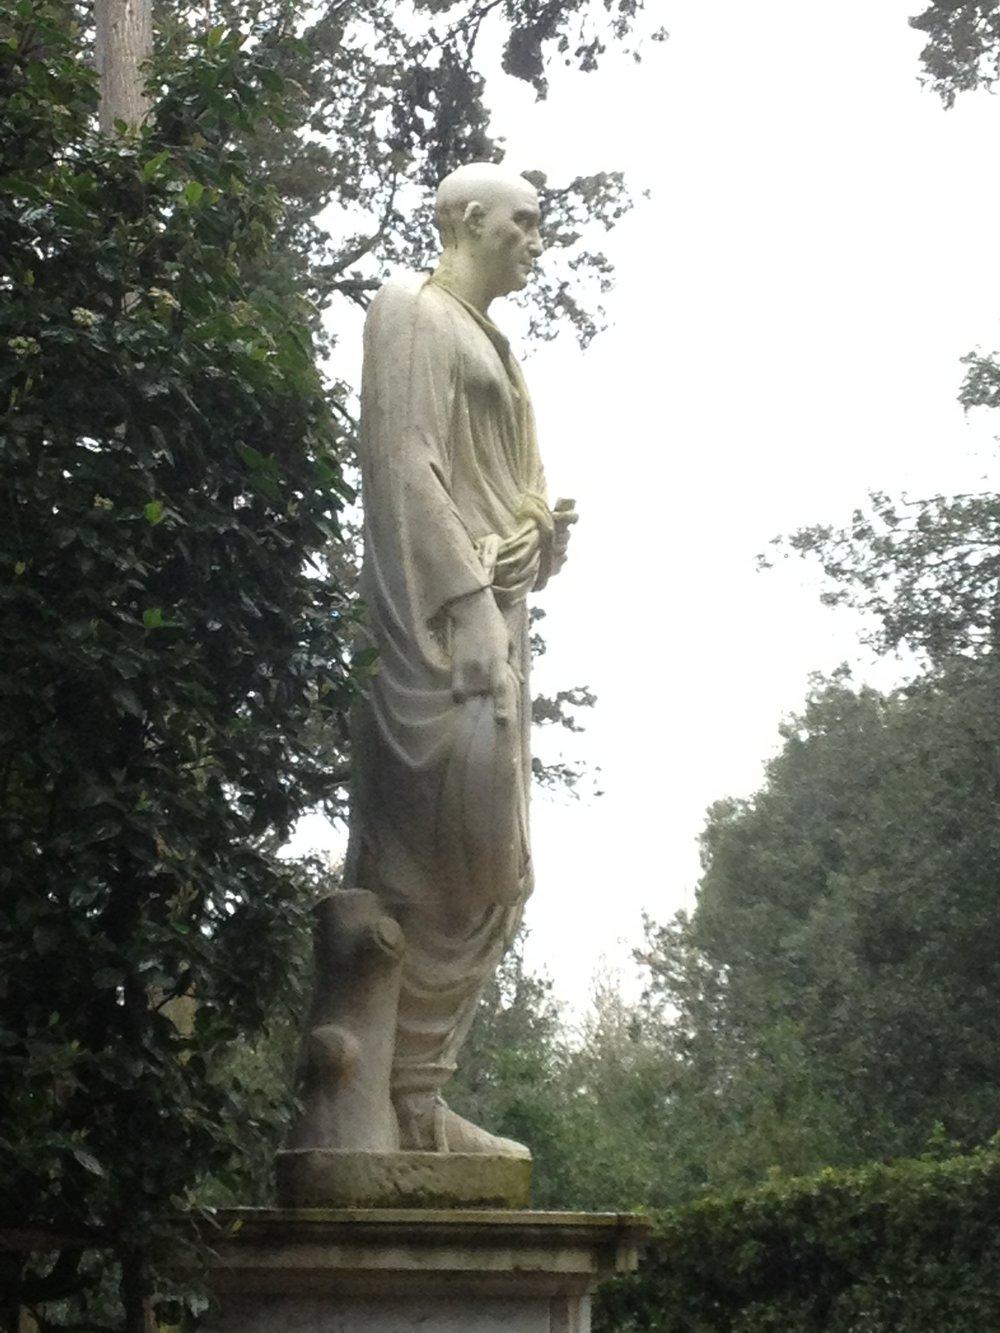 Pseudoithyphallic-iconography-statues-jessewaugh.com-12.jpg